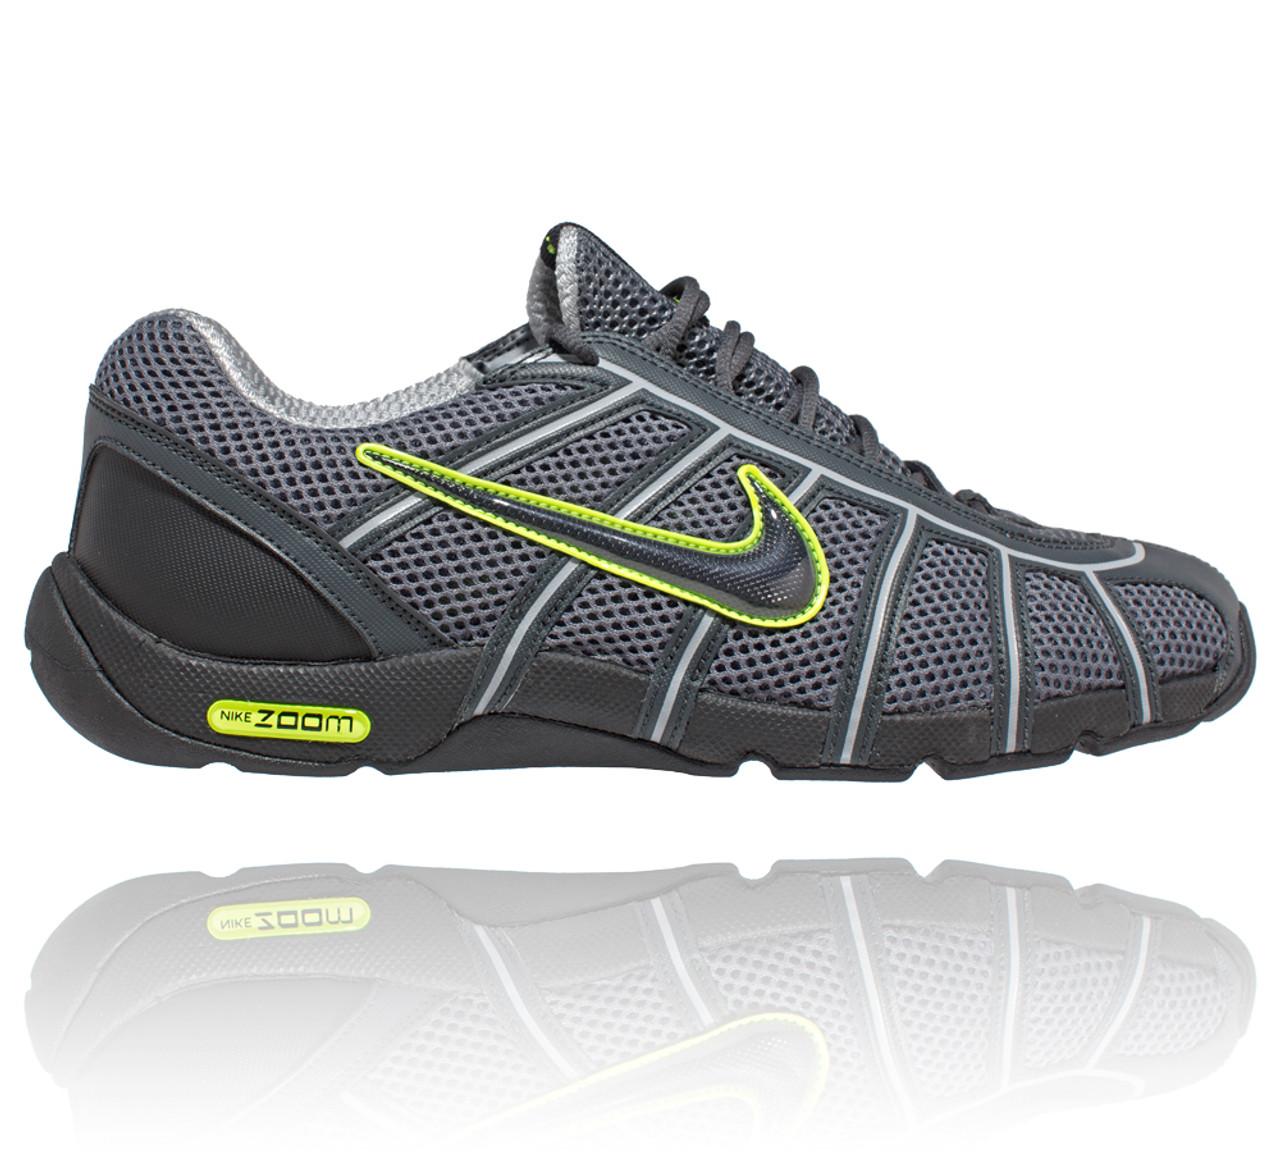 Chaussures Weyqty Volt Zoom D'escrime Nike Air Sequoia 5qRYwwF